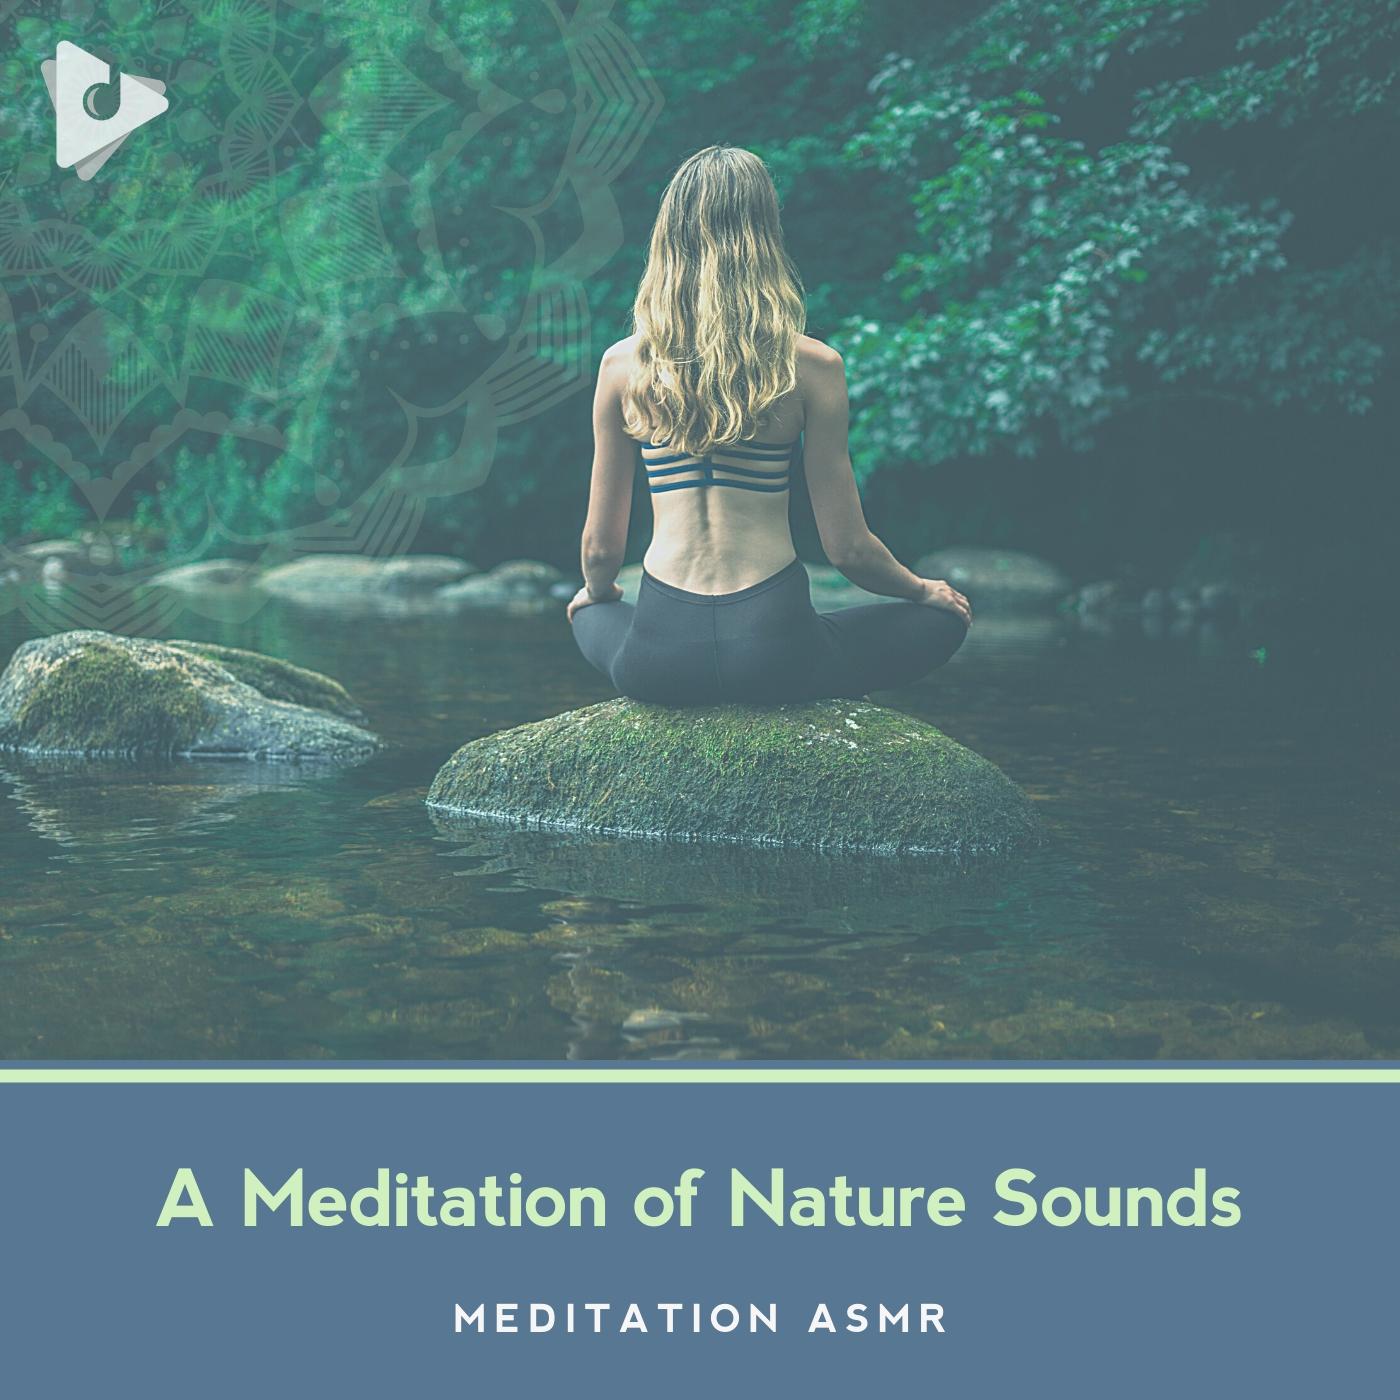 A Meditation of Nature Sounds